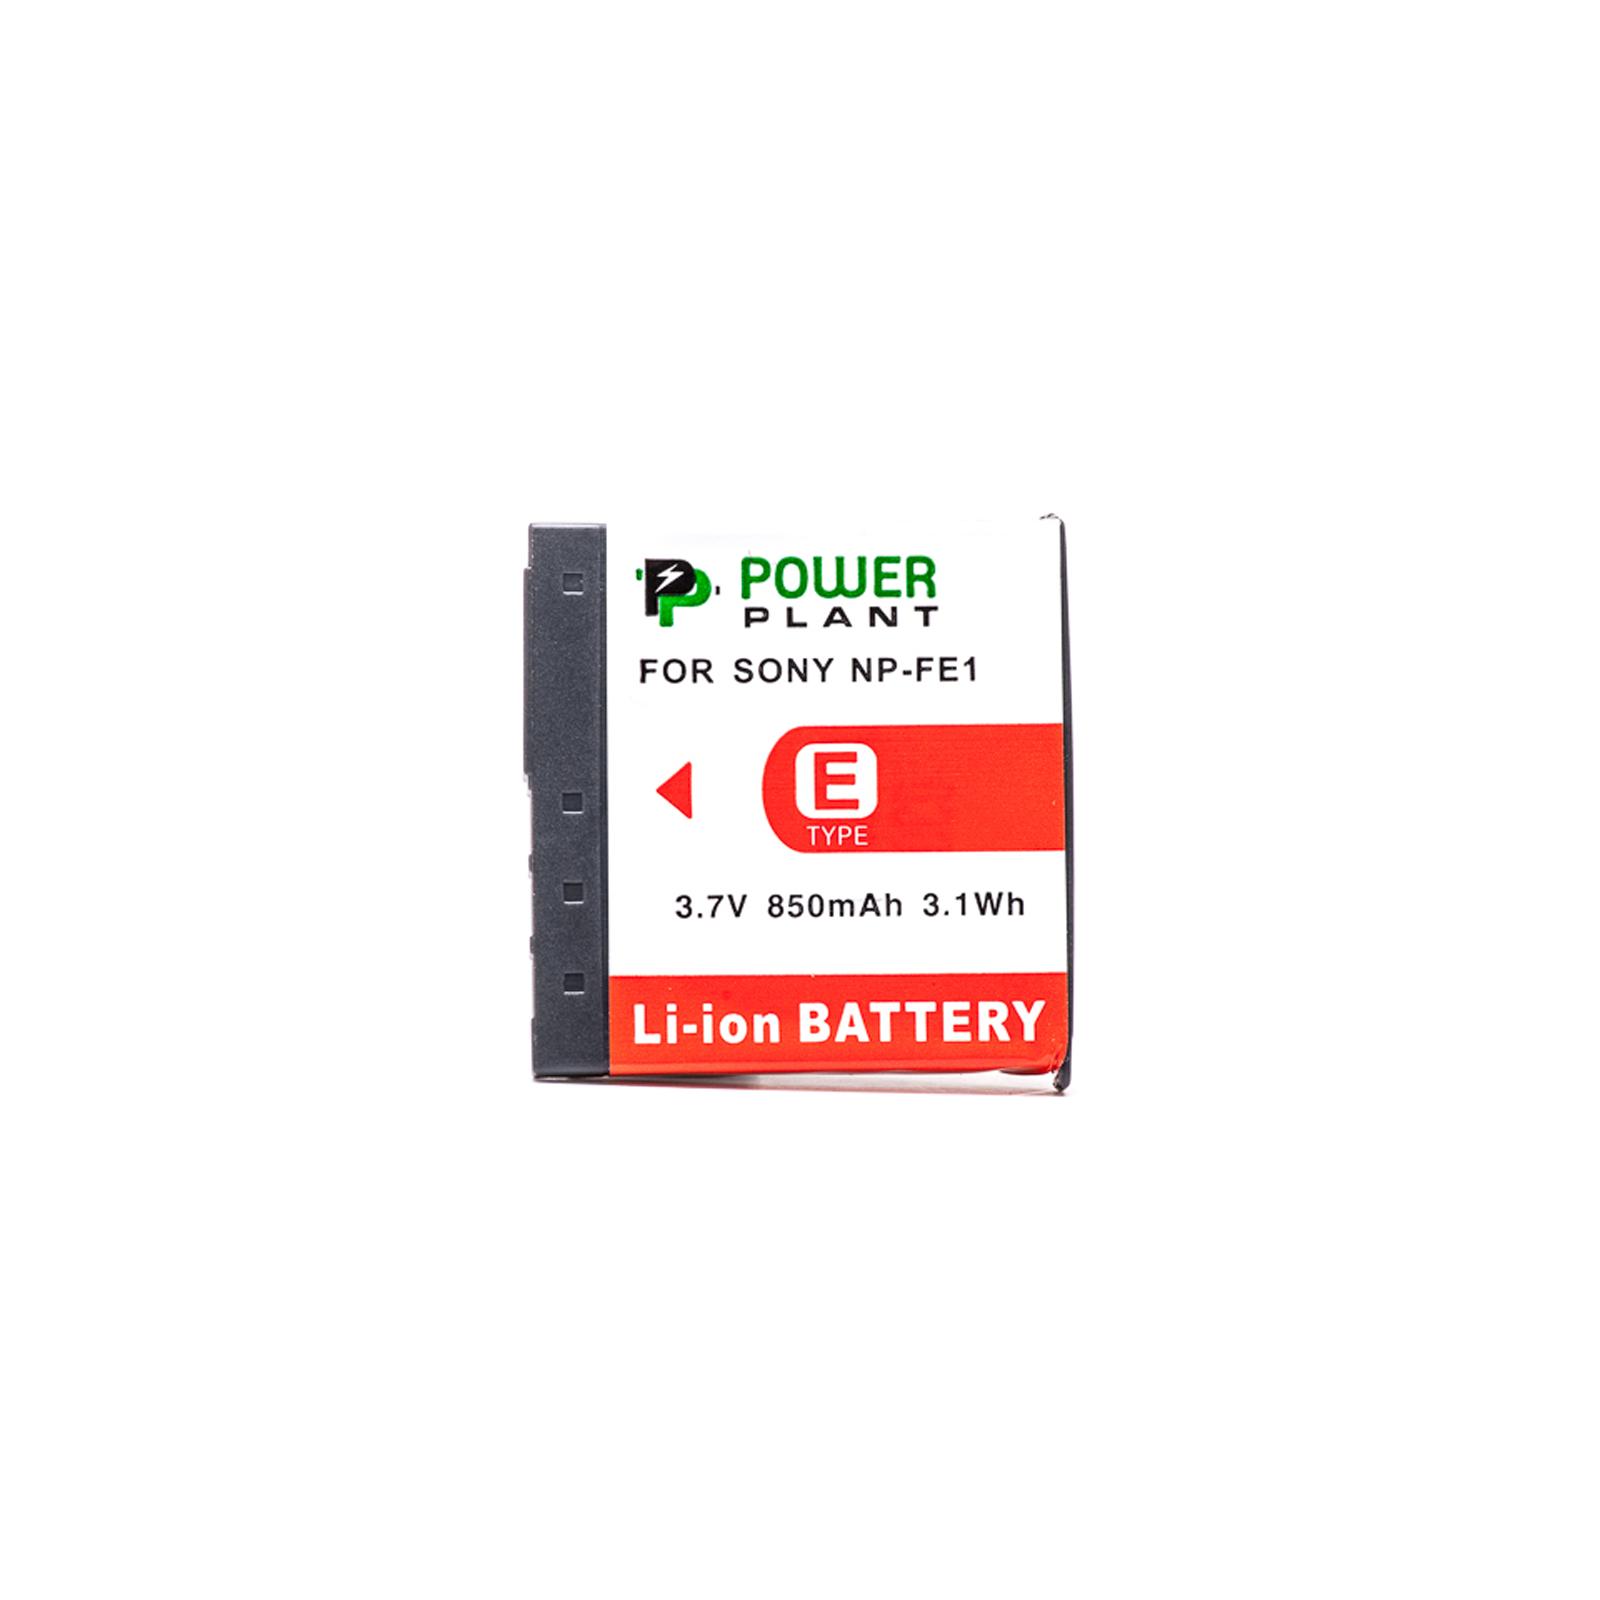 Аккумулятор к фото/видео PowerPlant Sony NP-FE1 (DV00DV1062) изображение 2